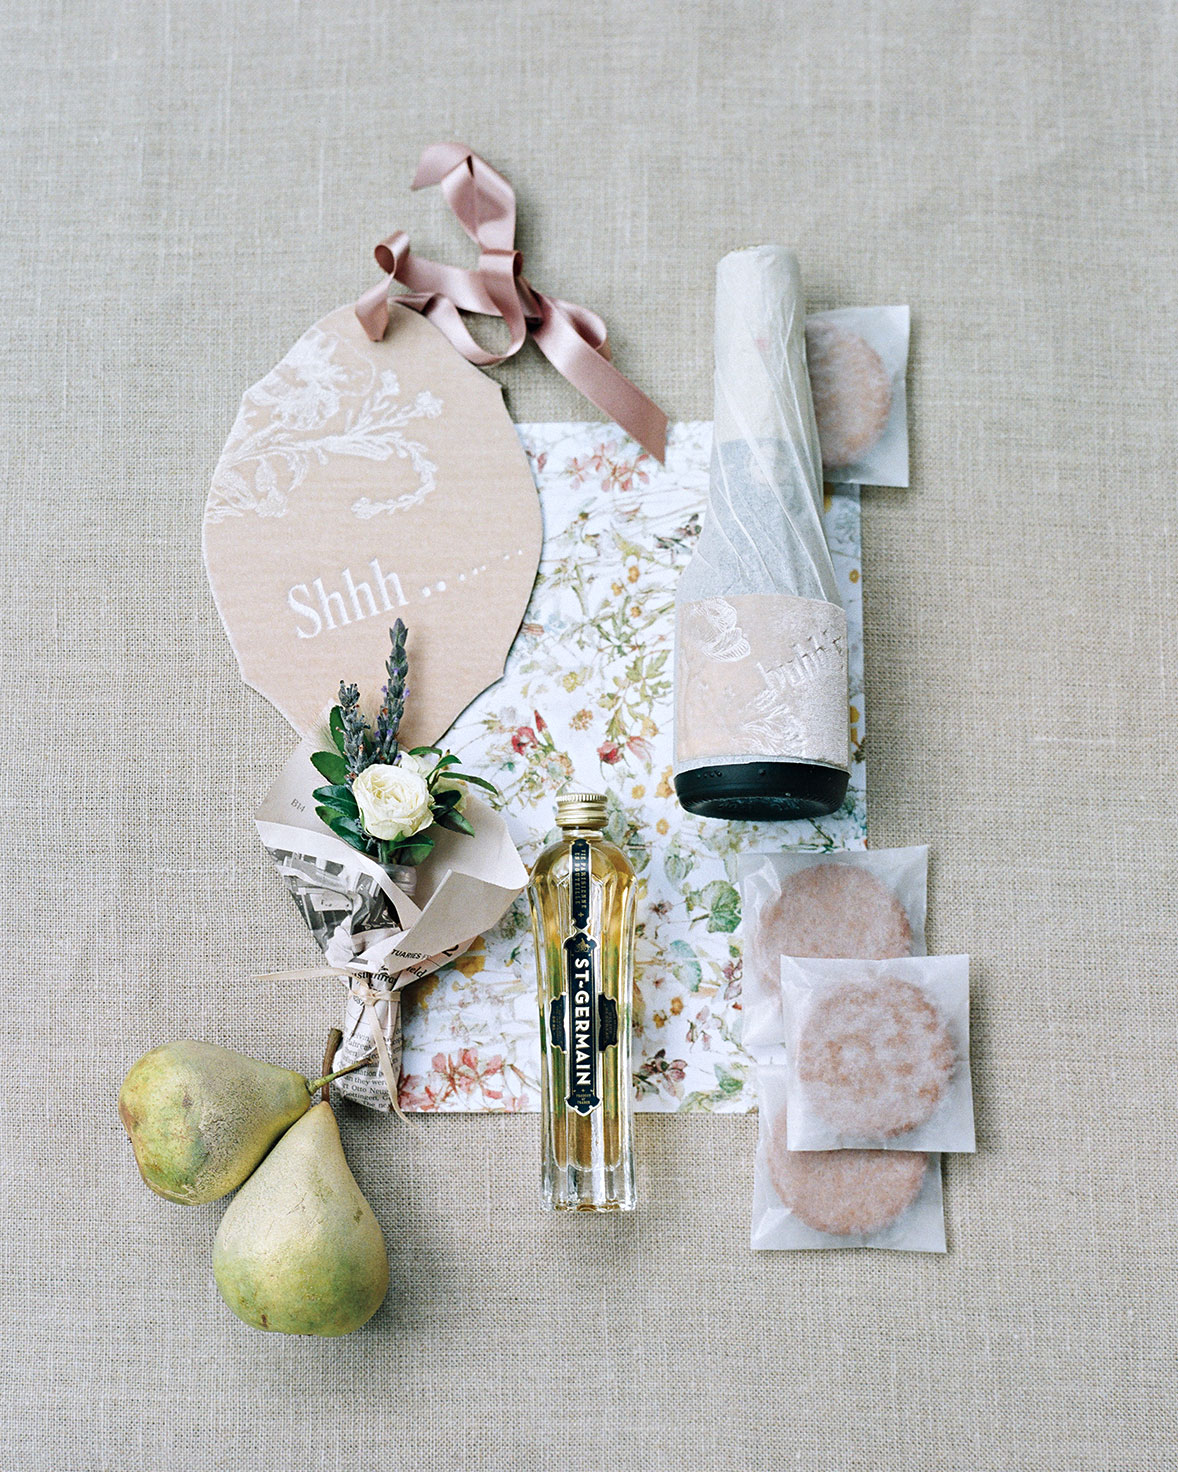 adrienne-jason-wedding-minnesota-welcome-basket-0048-s111925.jpg